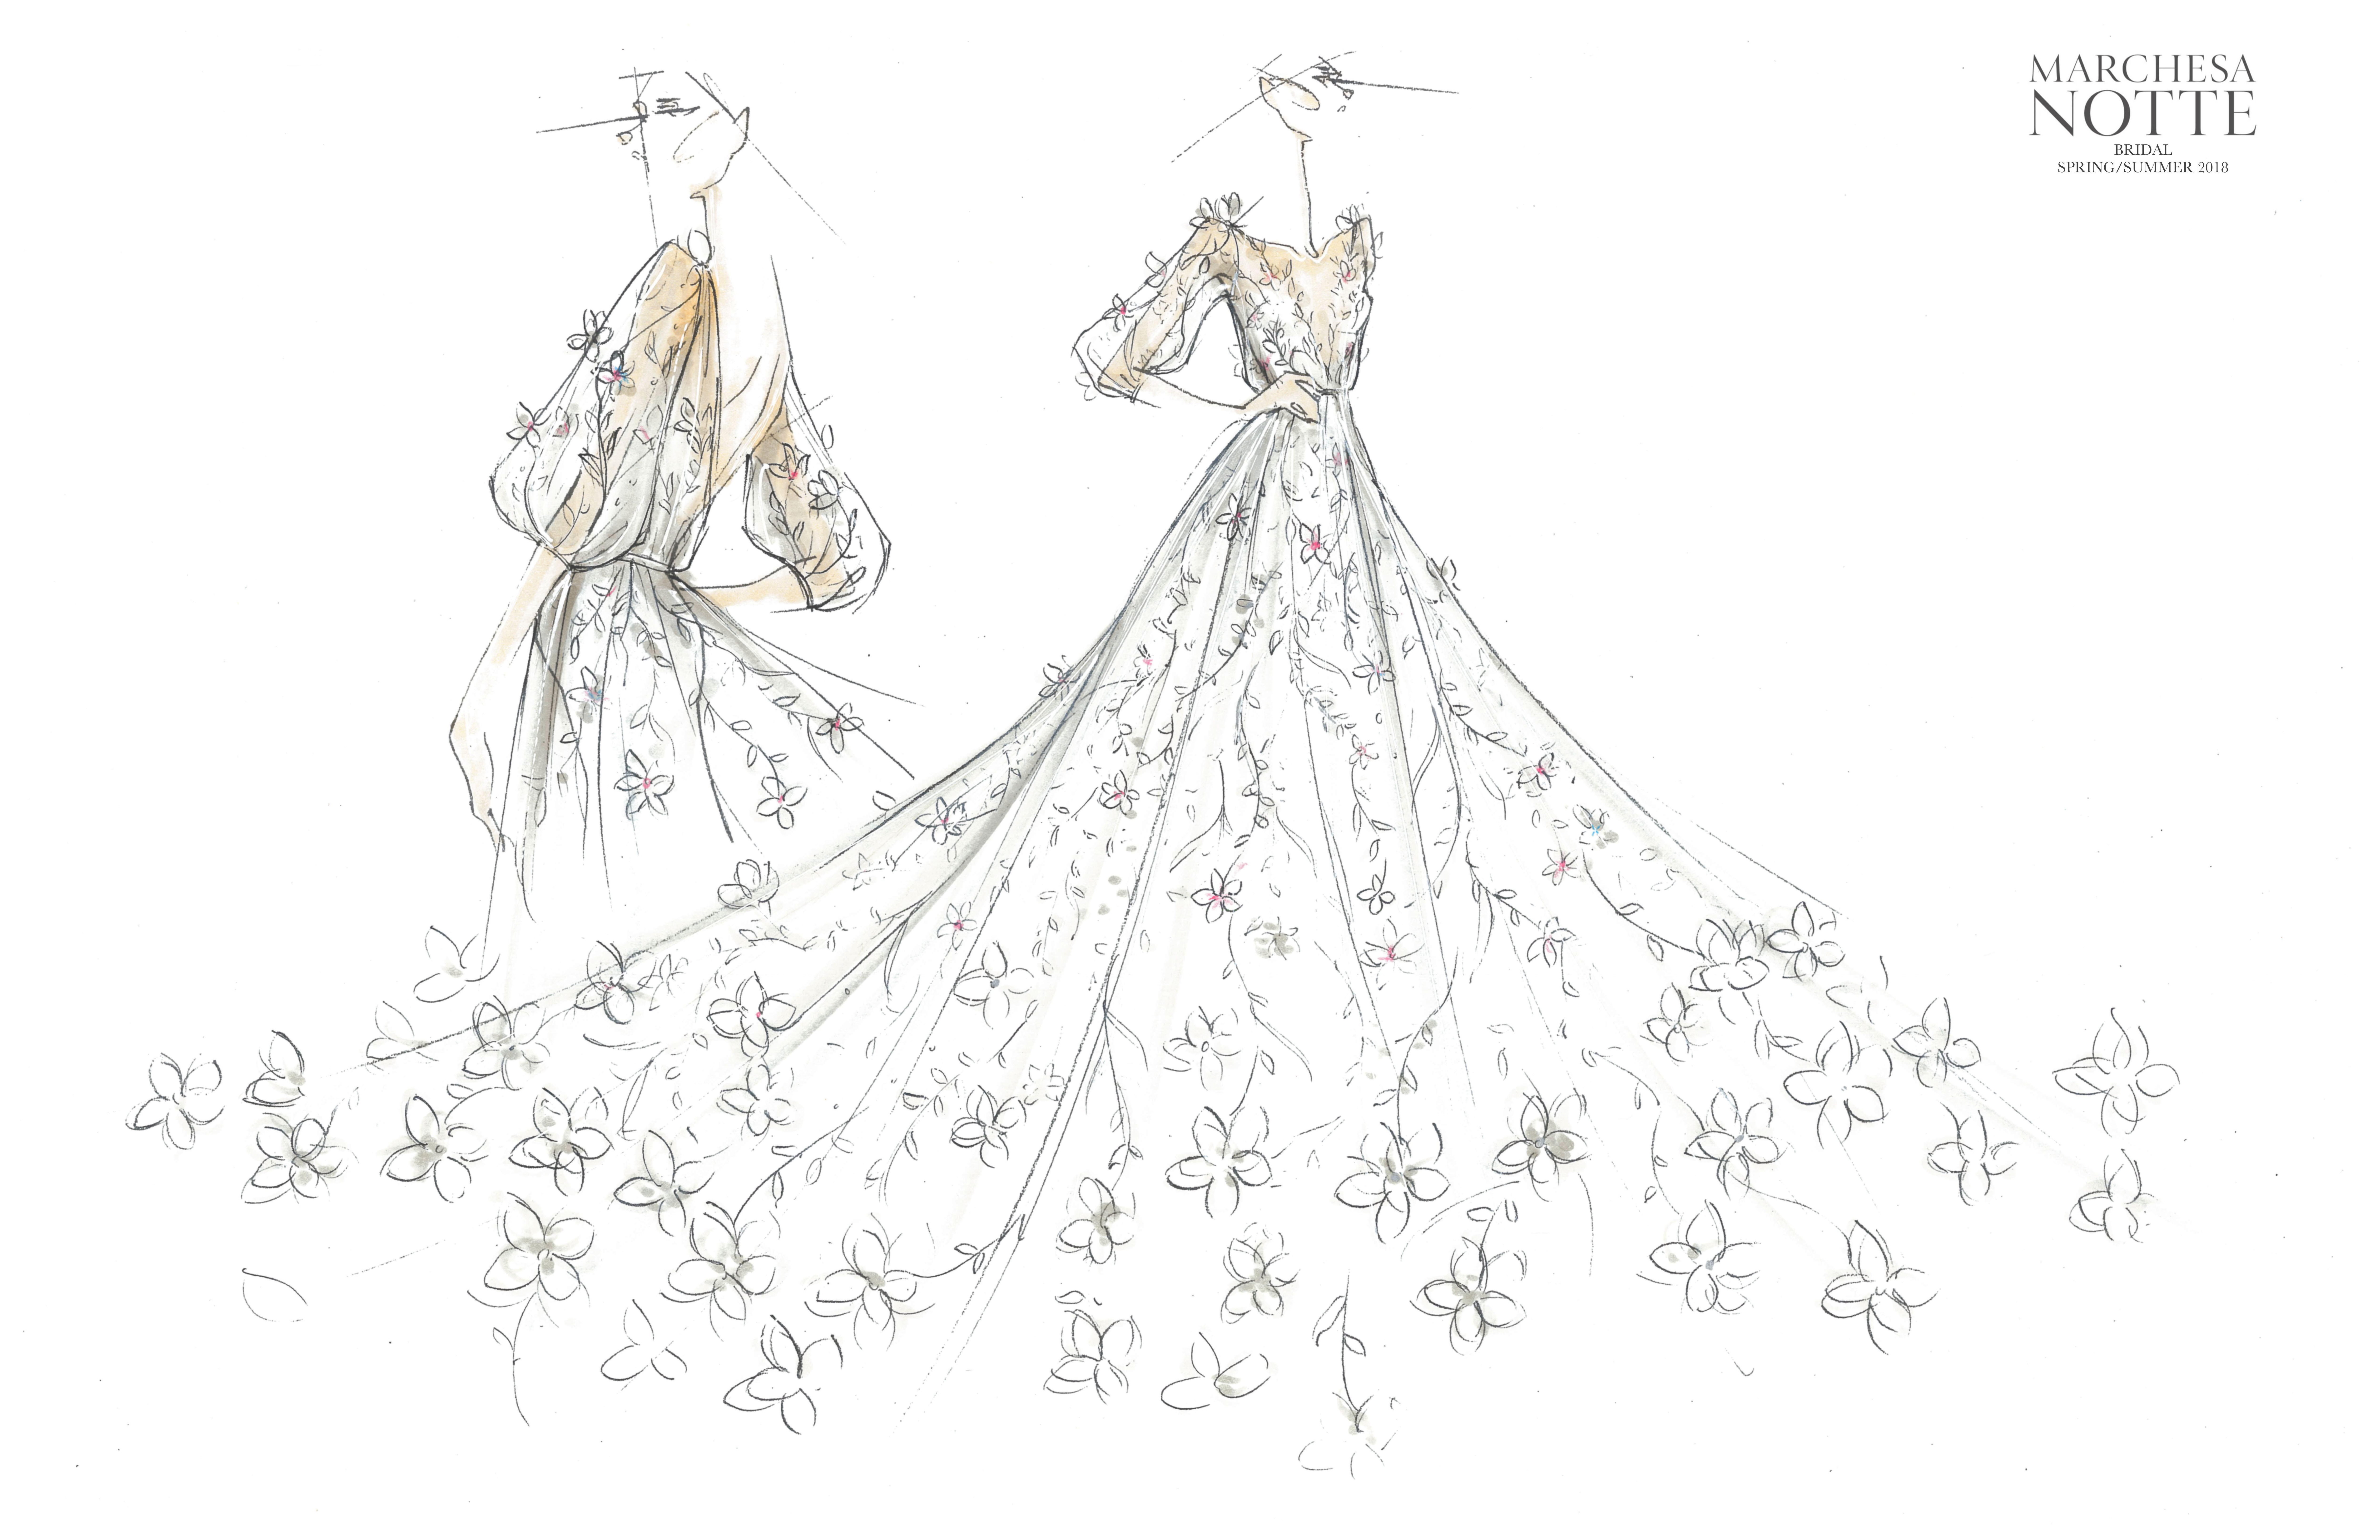 Spring 2018 BFW Sketches Marchesa Notte Bridal